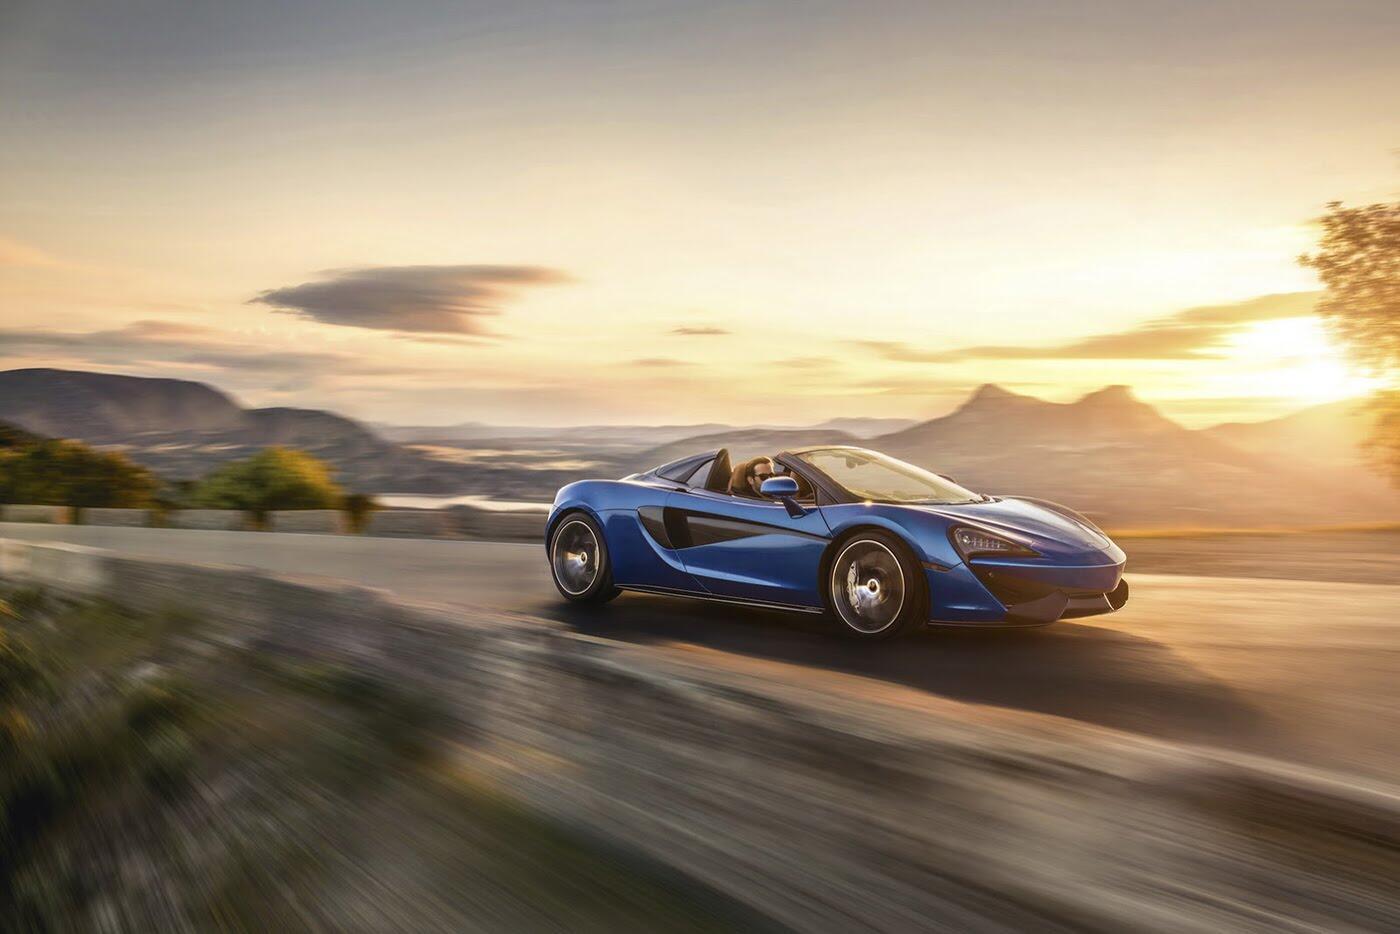 Siêu xe McLaren 570S Spider sắp ra mắt - Hình 1